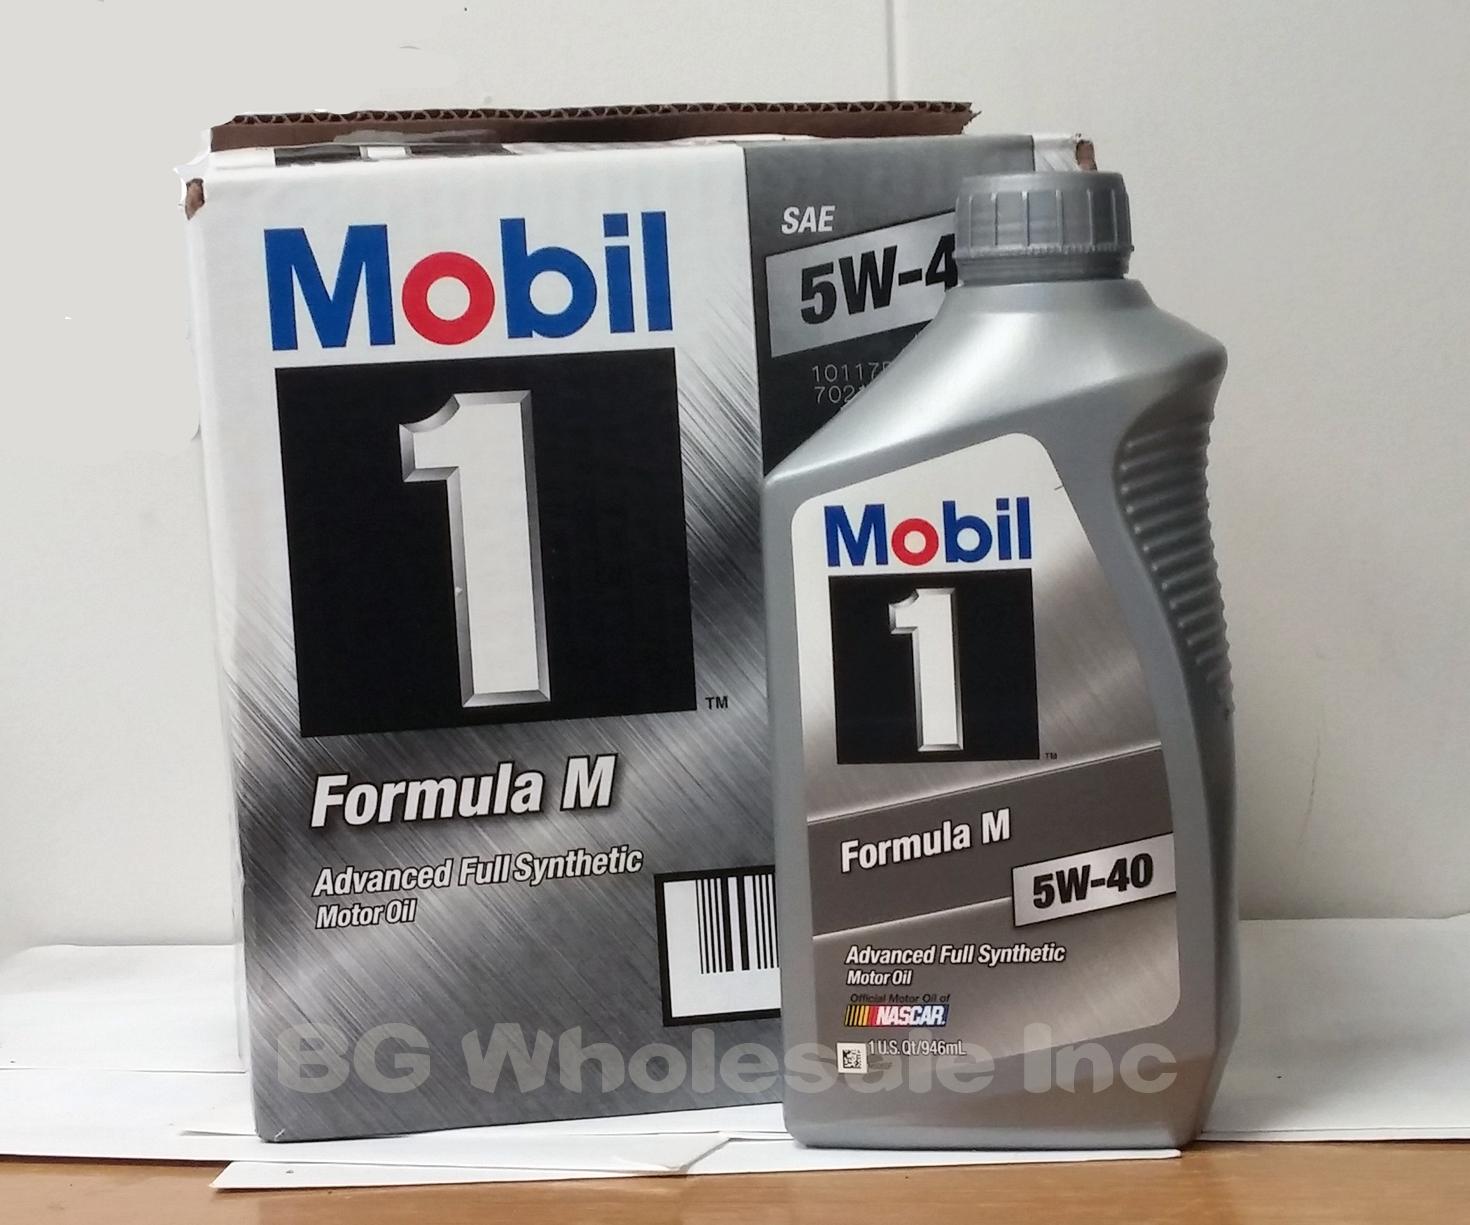 mobil 1 formula m 5w 40 6 quarts to a case approved. Black Bedroom Furniture Sets. Home Design Ideas